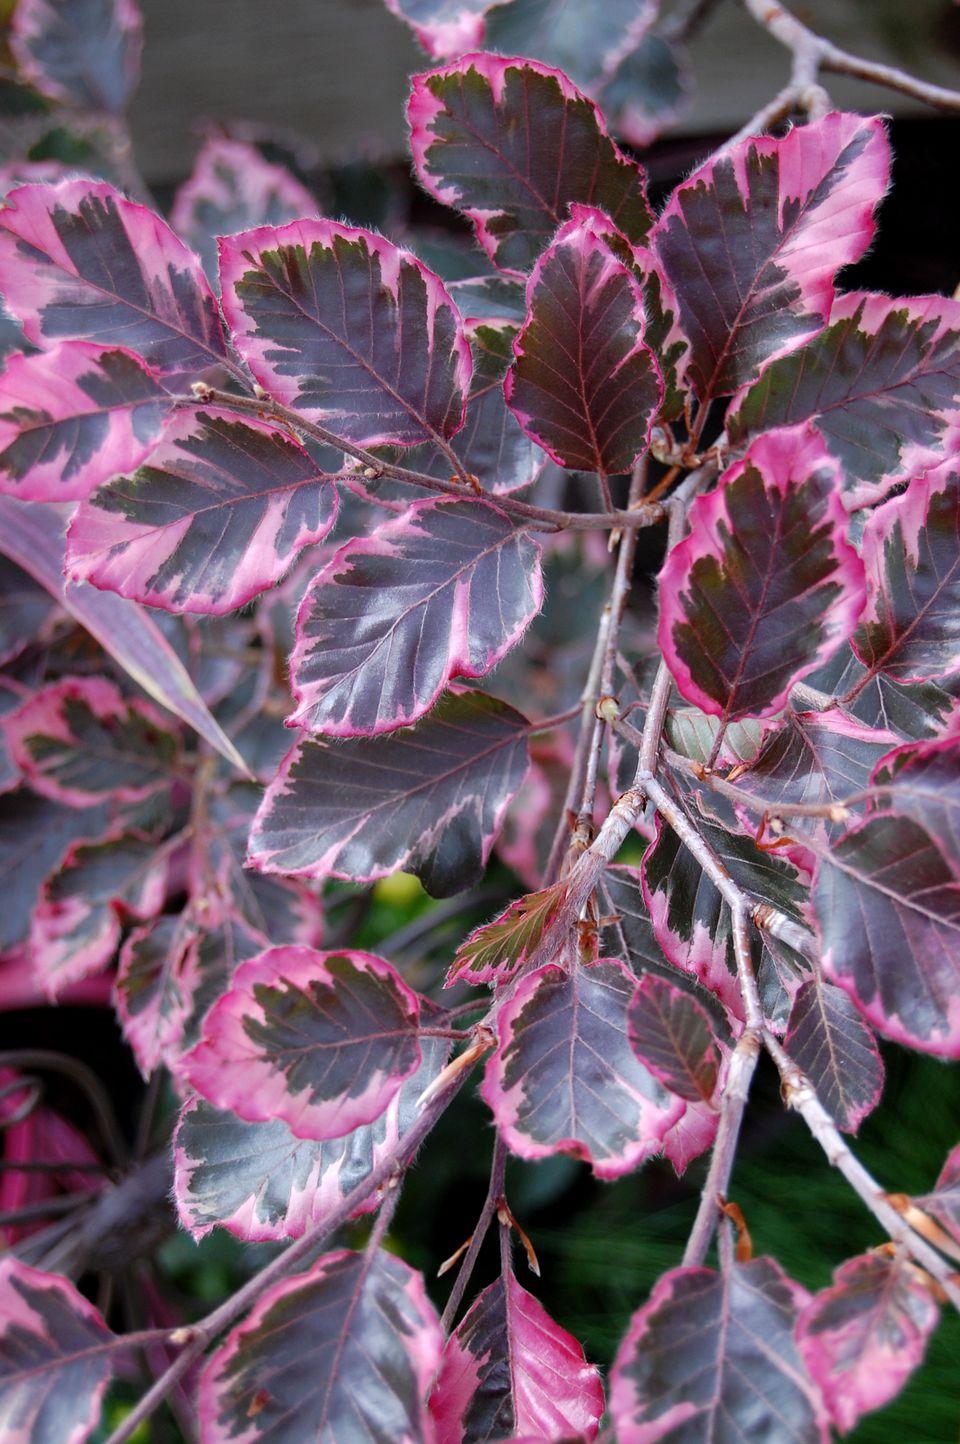 Fagus sylvatica - Tri Color Birch Tree leaf photos